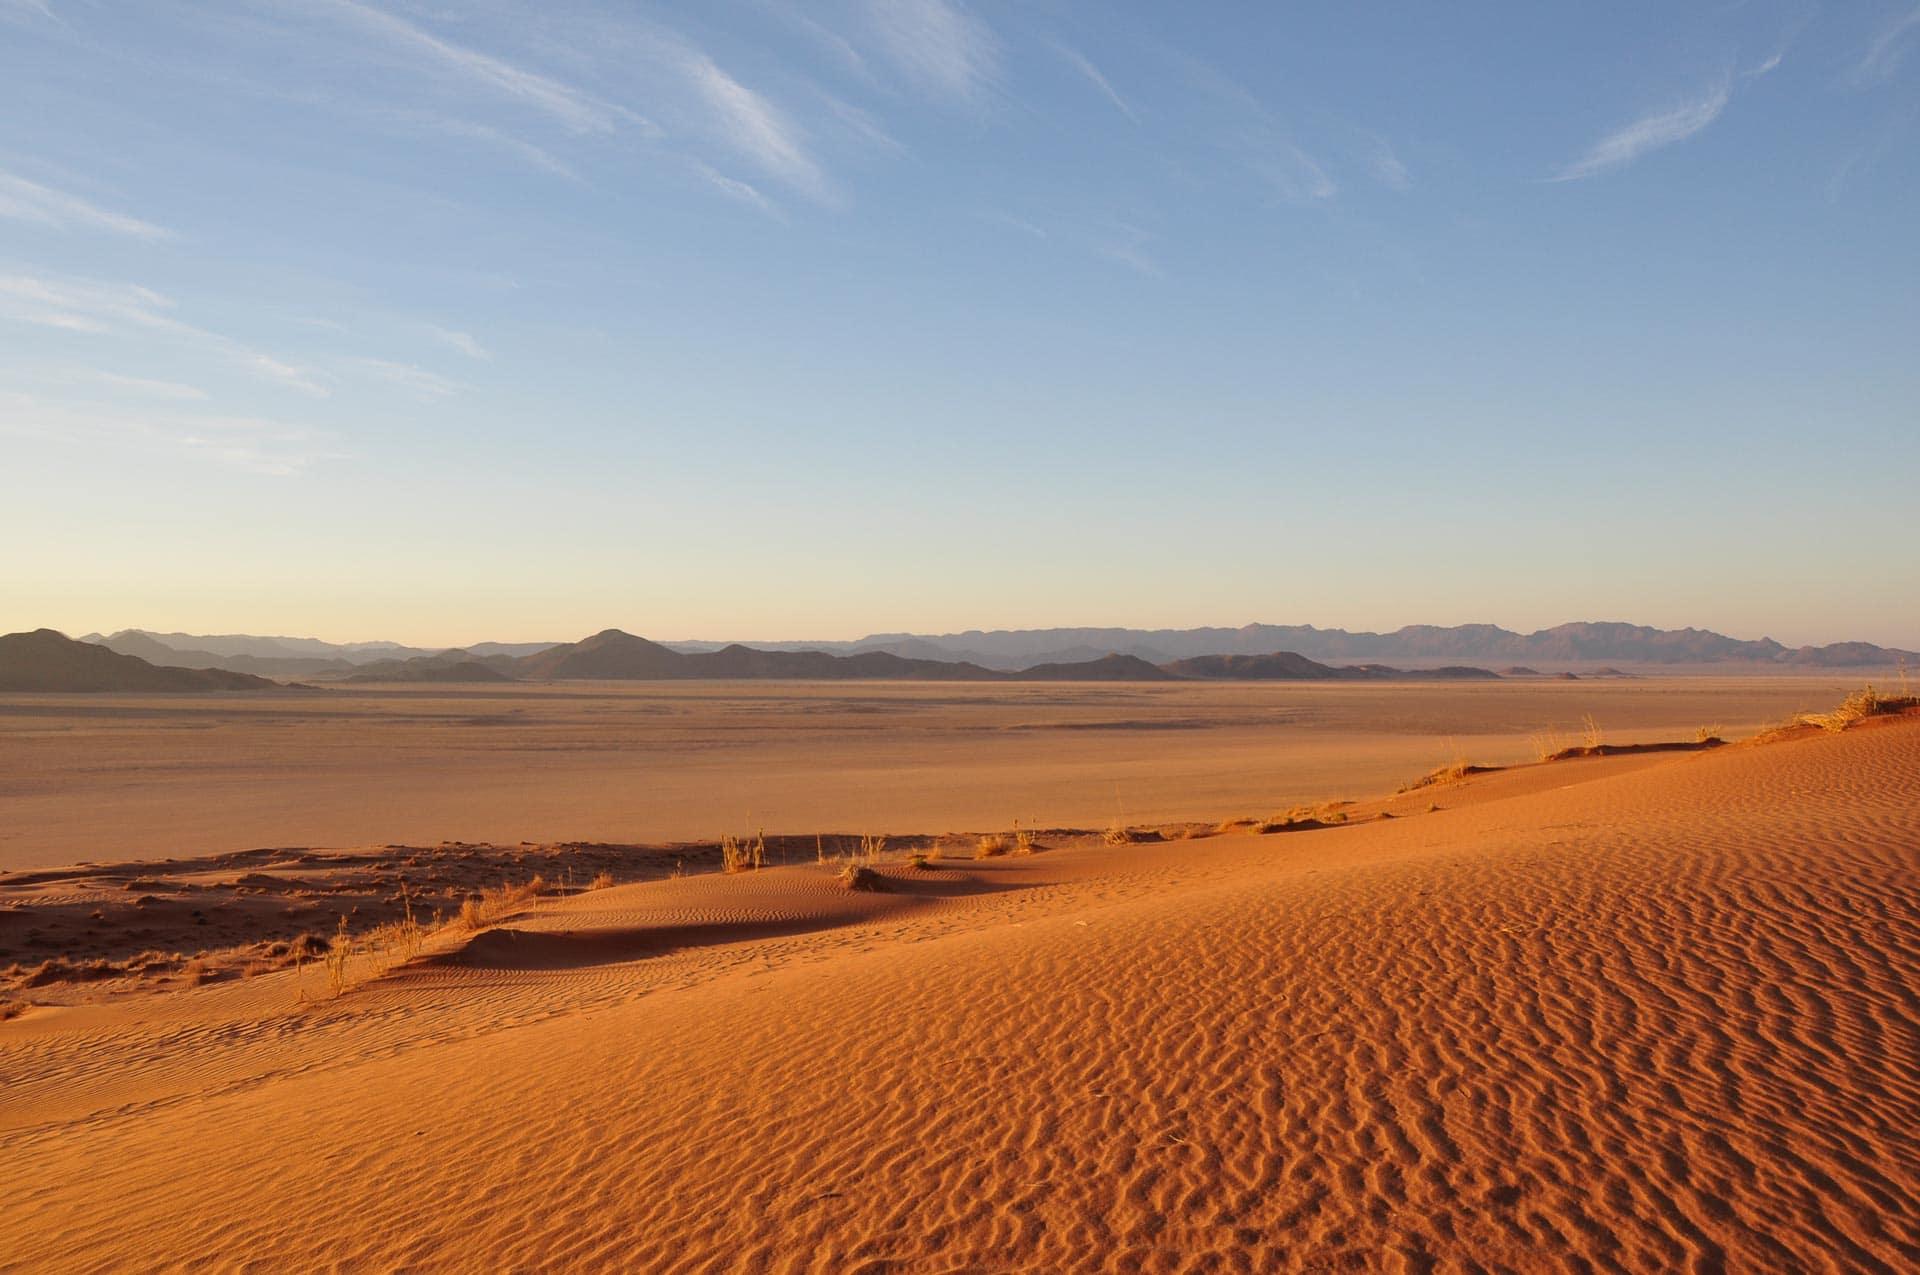 Kanaan-Desert-Retreat-Namibia-Globetrotter-Select-33